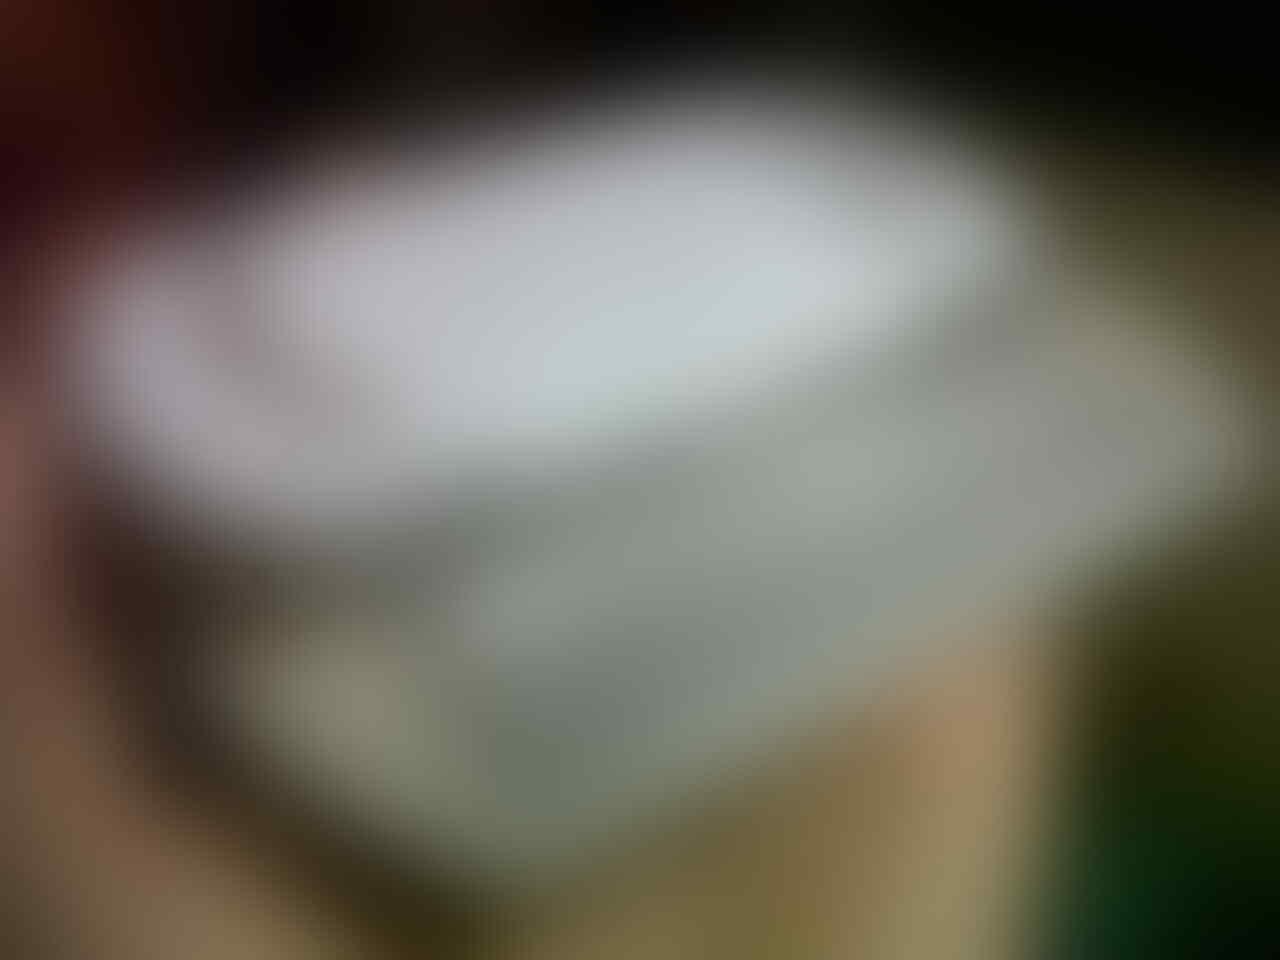 jual PSP GO pearl white mulus, lengkap, dapet bonus, MURAHHH (bandung)